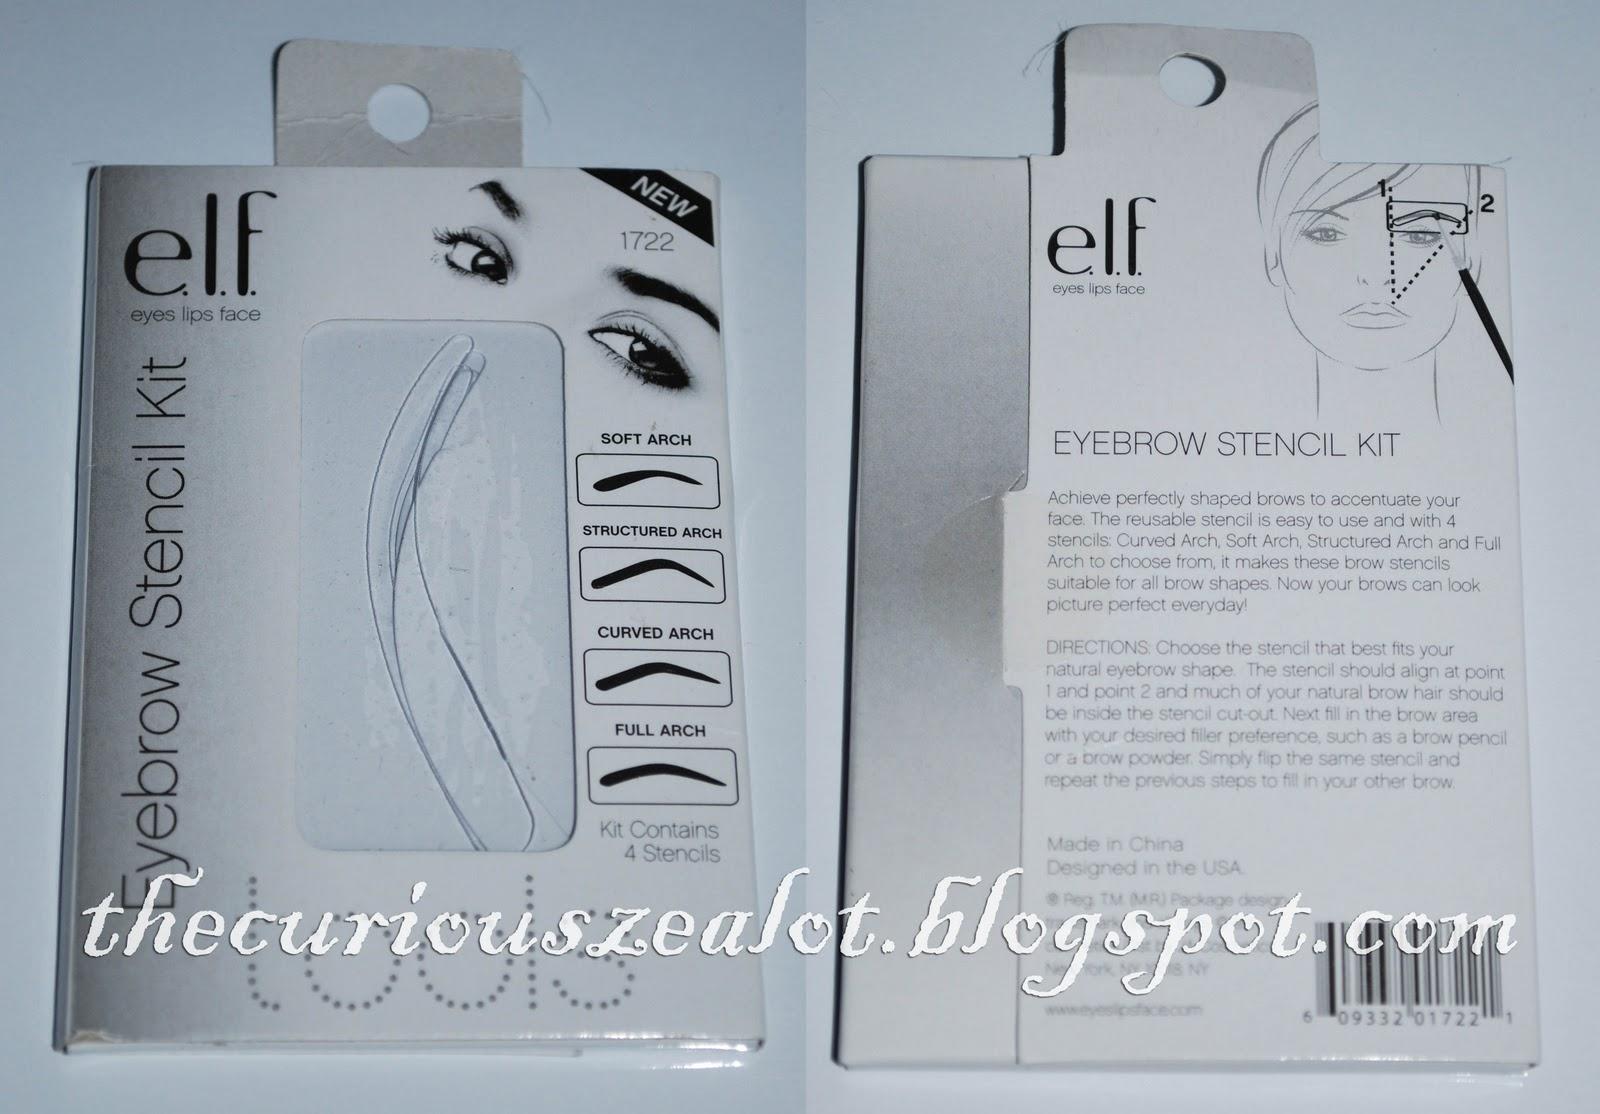 The Curious Zealot Elf Eyebrow Stencil